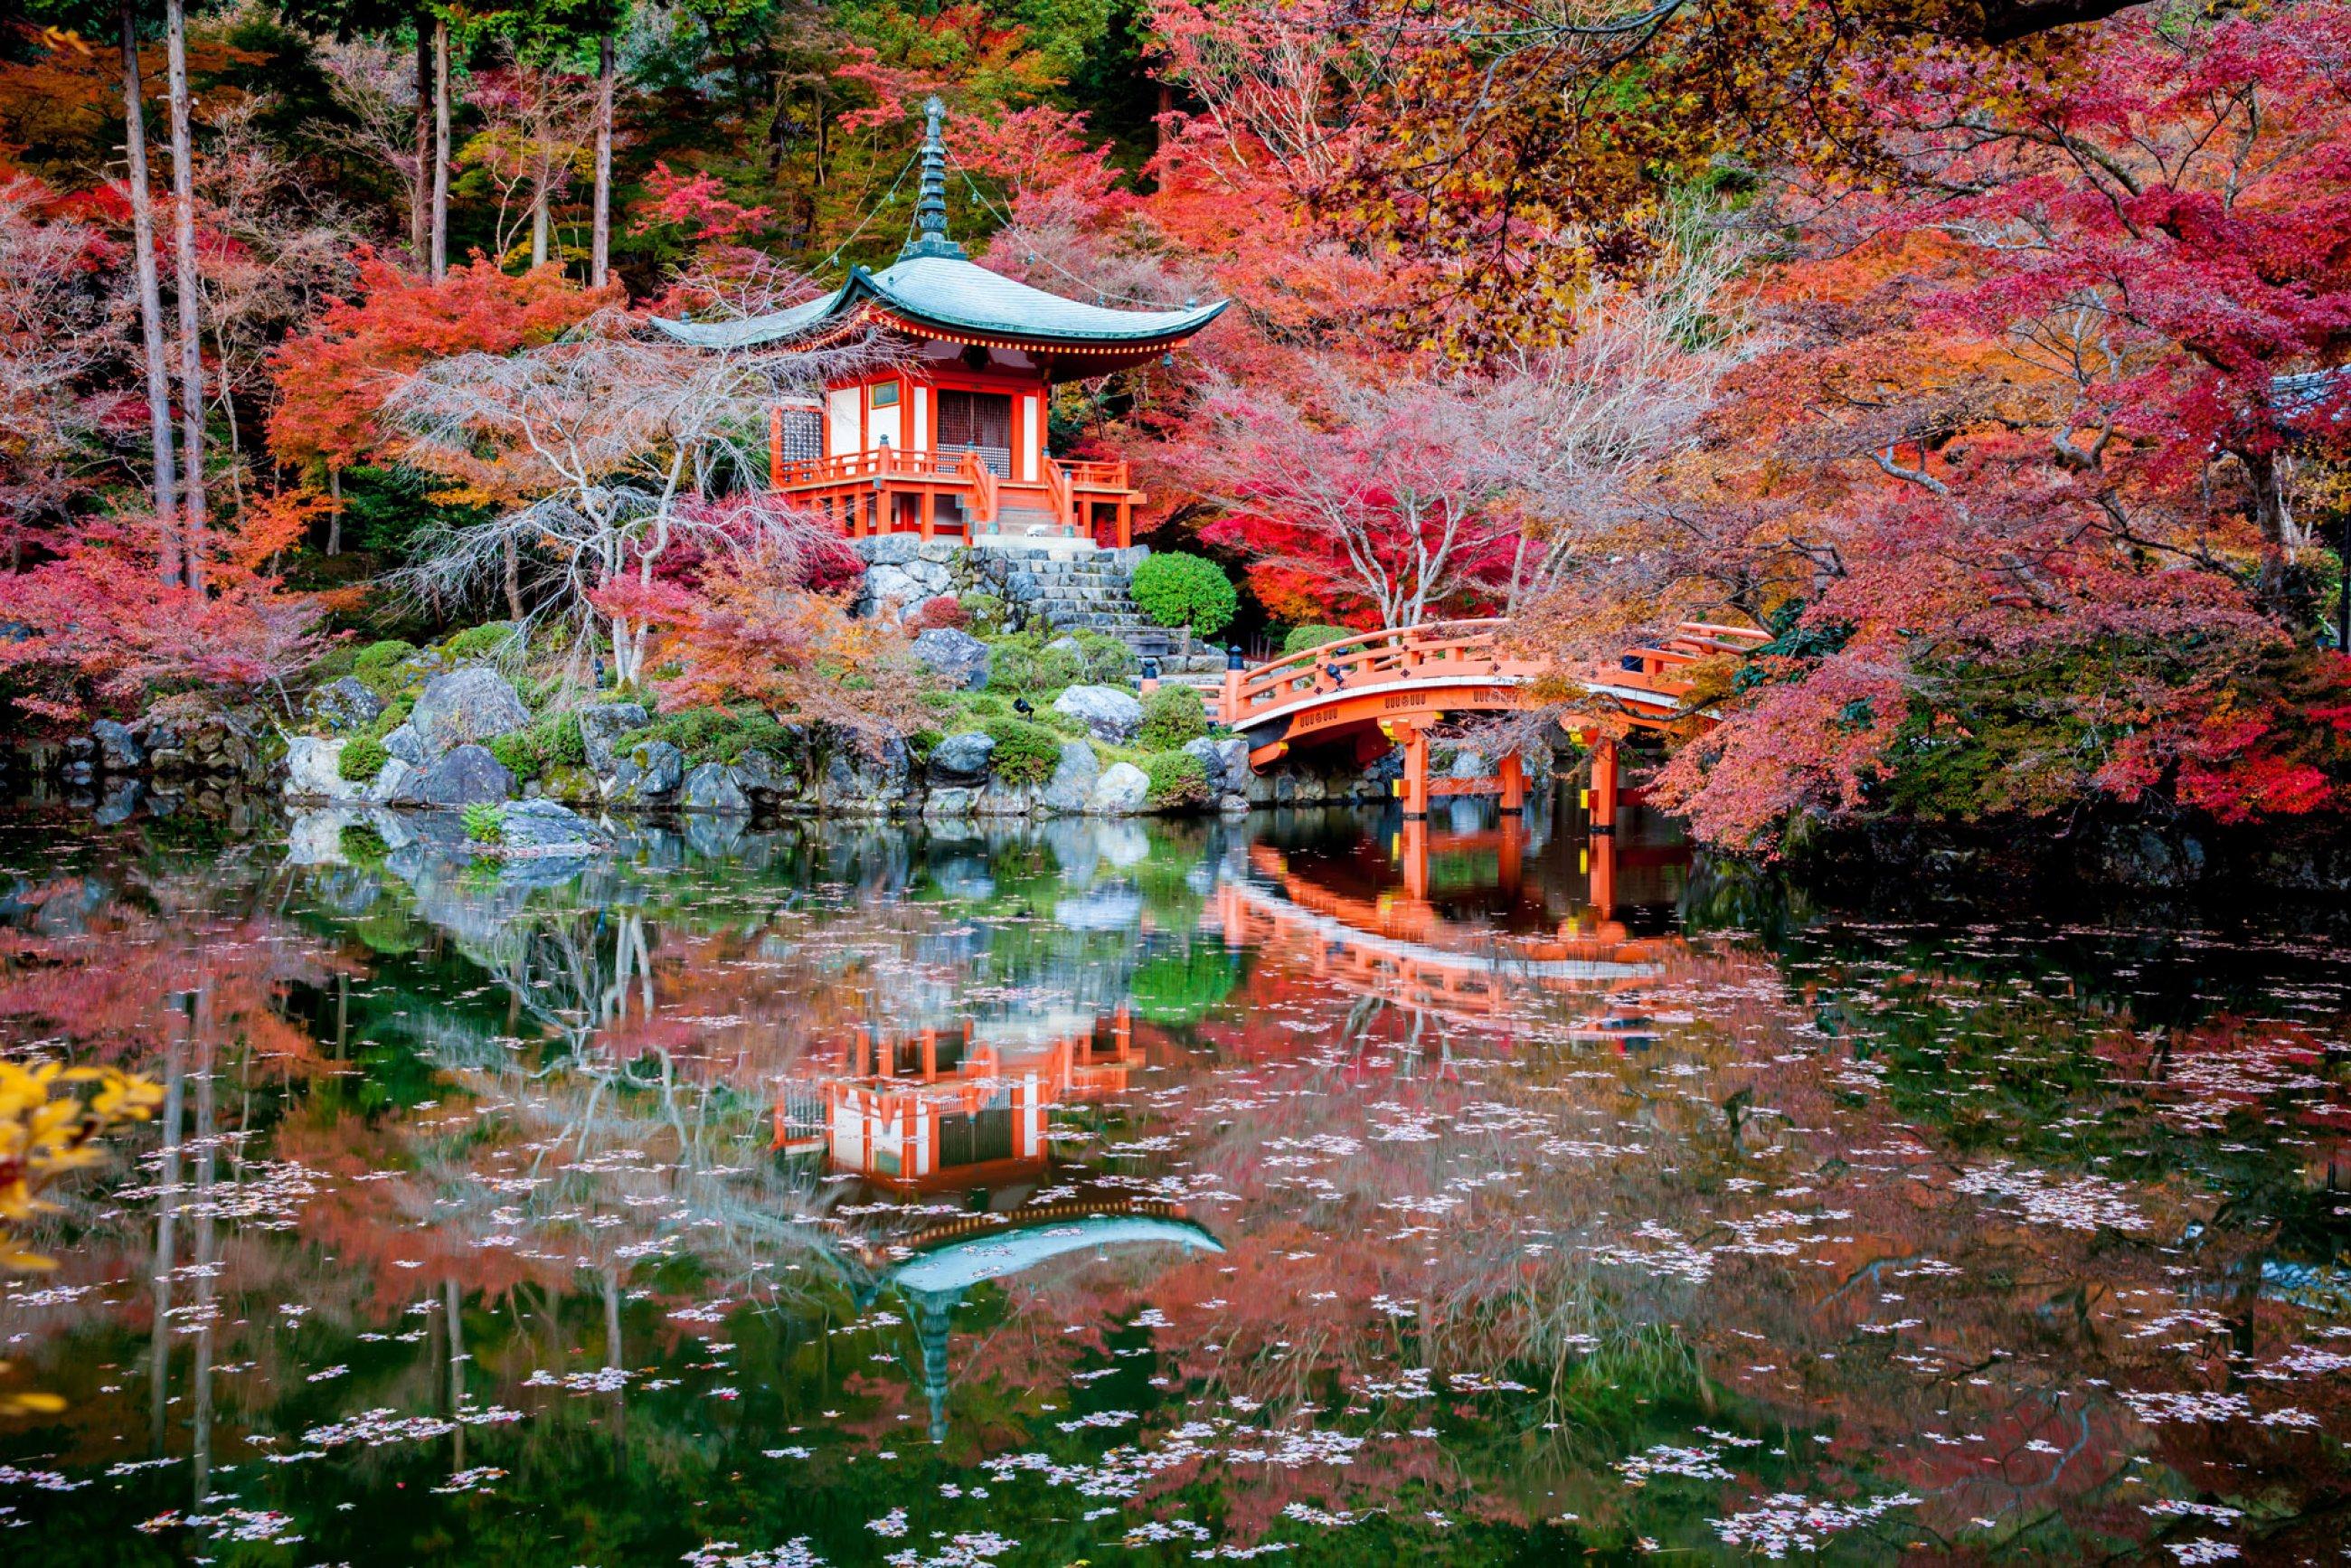 https://bubo.sk/uploads/galleries/4930/japonsko-daigoji-temple-japan.jpg